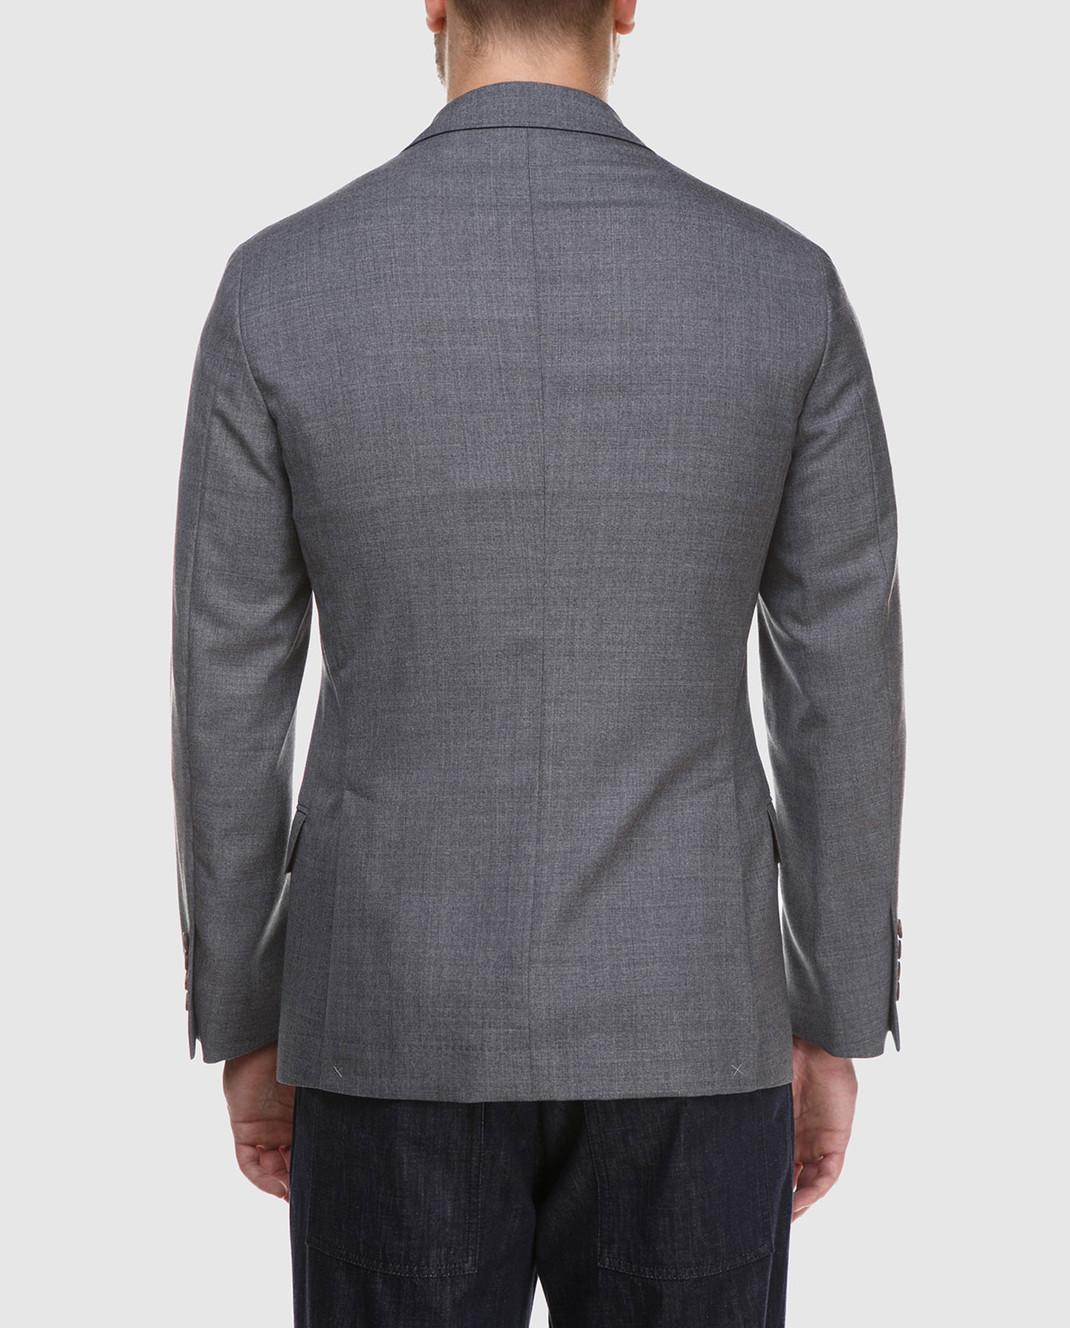 Brunello Cucinelli Серый пиджак из шерсти MF4237BTD изображение 4